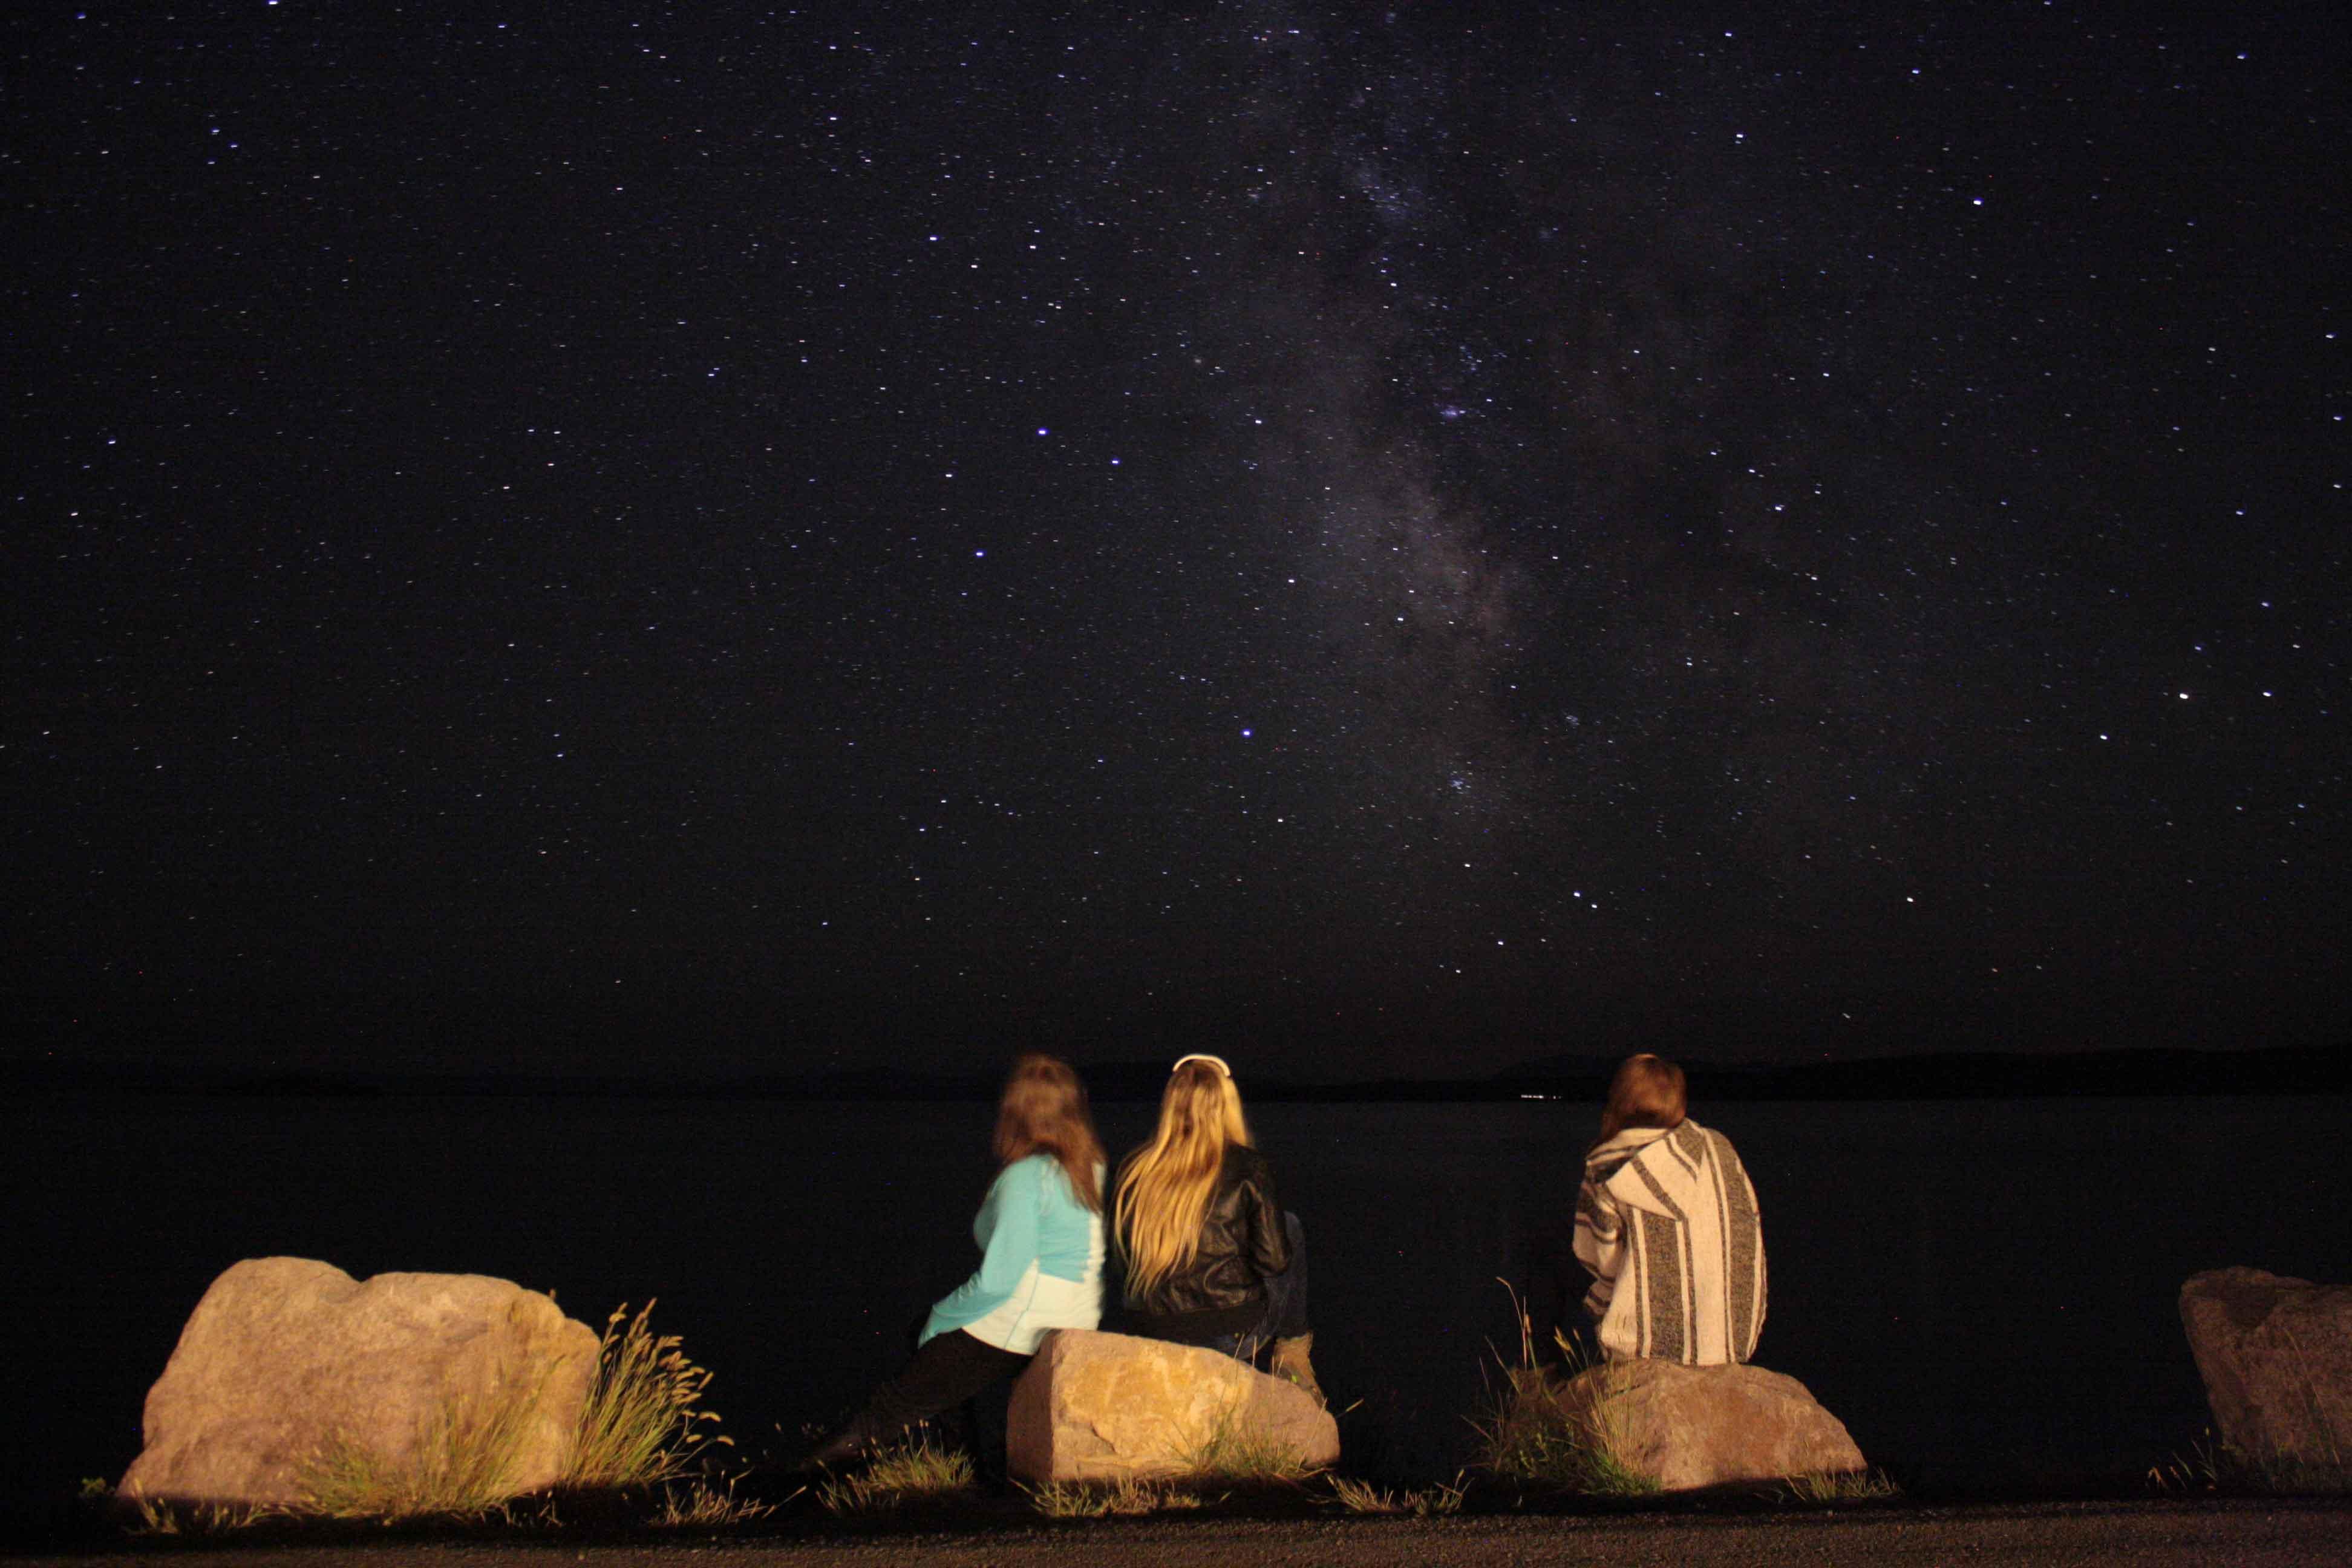 Star-Gazing_Karley-Nugent